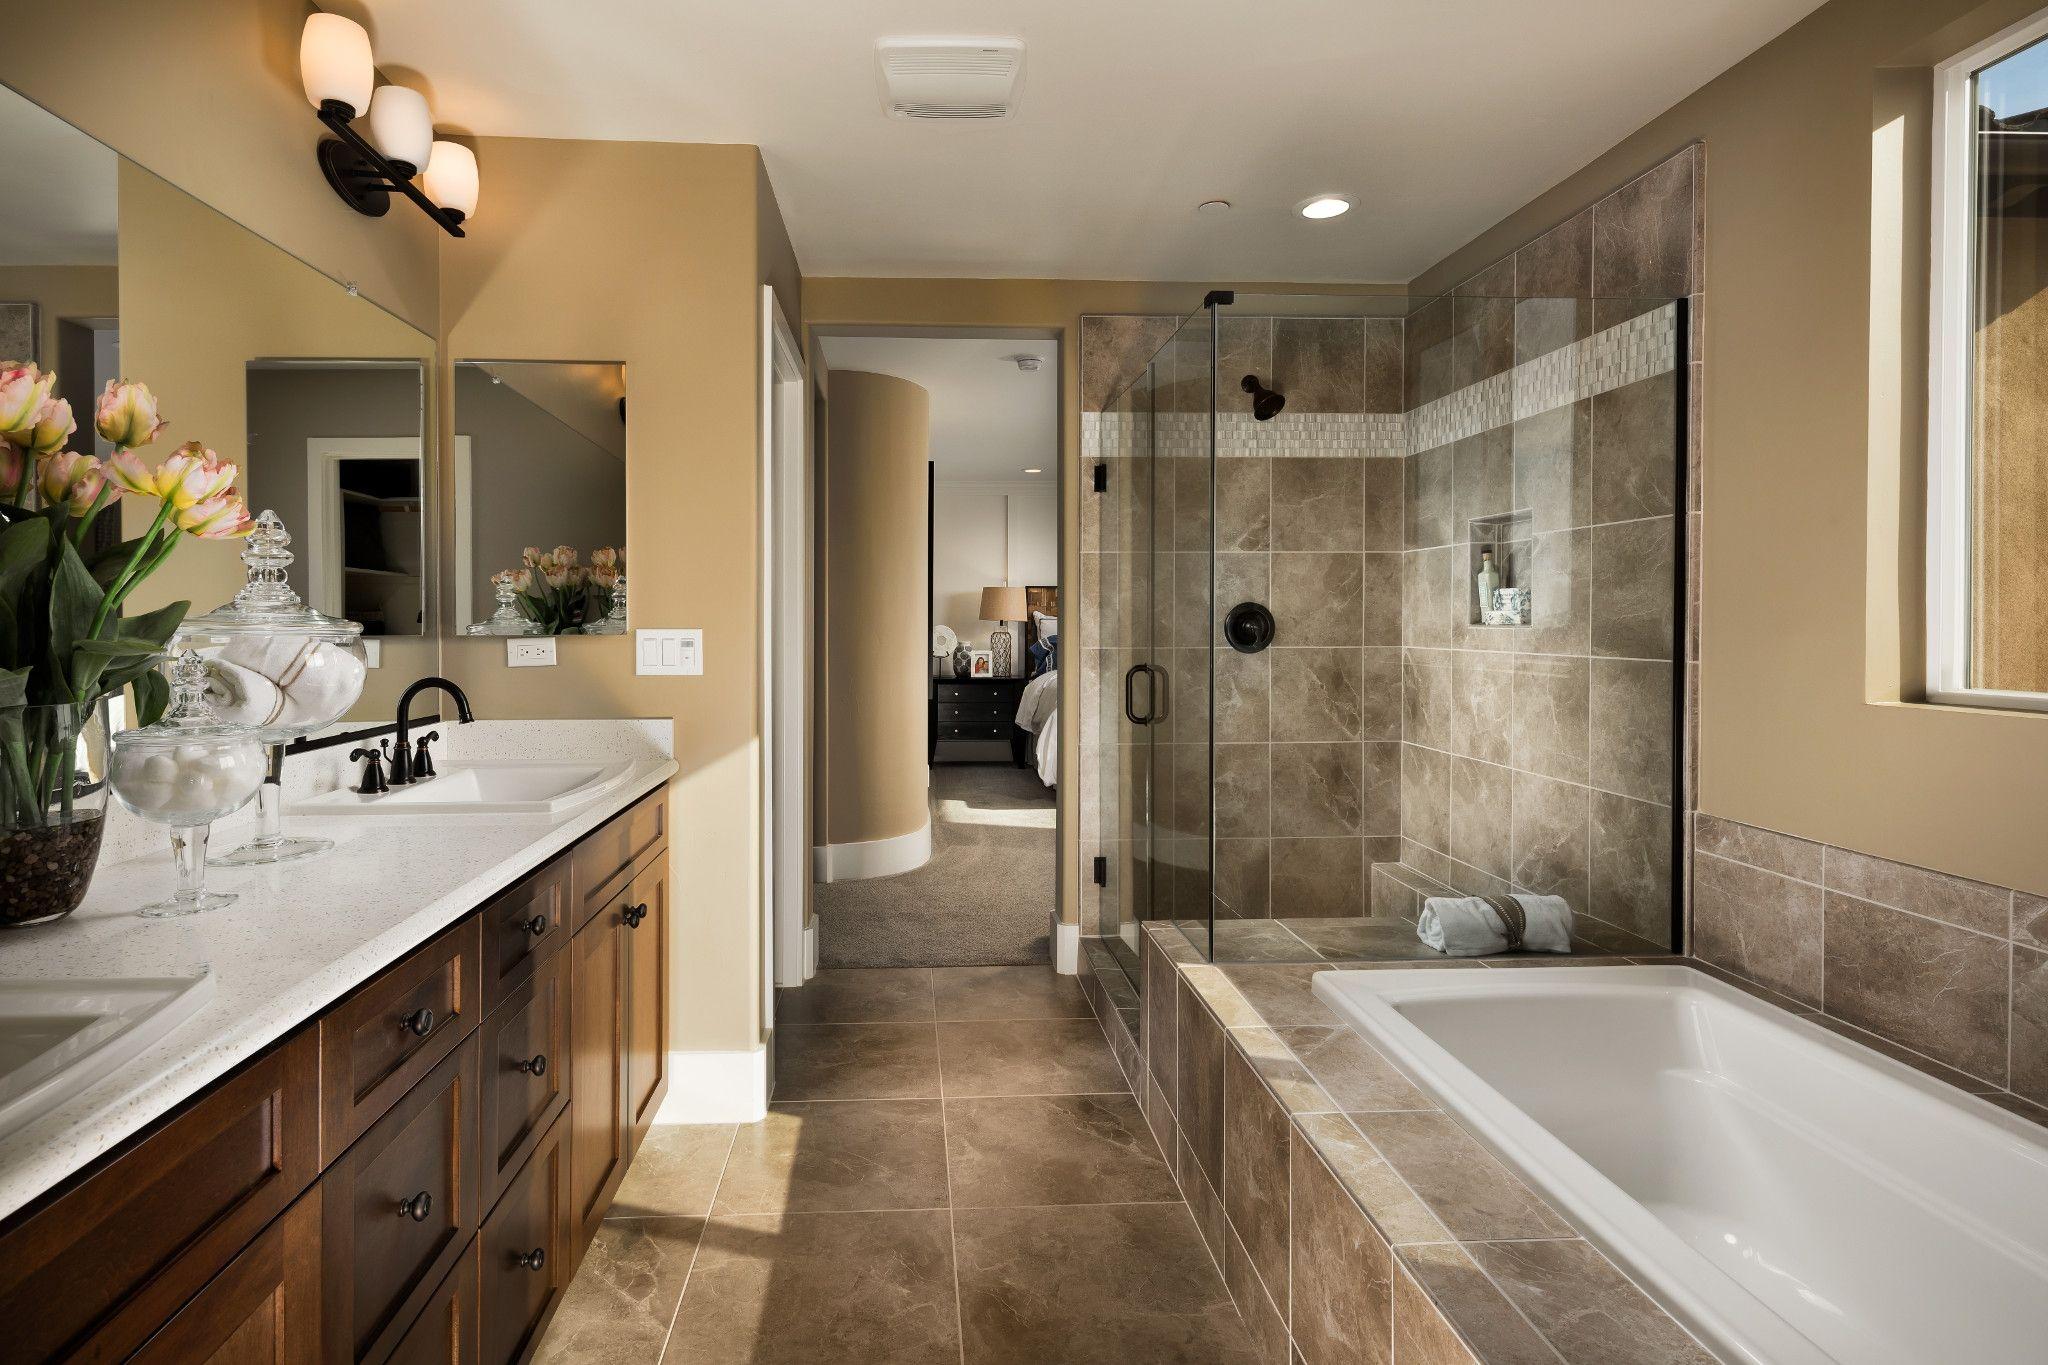 Bathroom featured in the Verbena By Shea Homes - Trilogy in Santa Barbara, CA